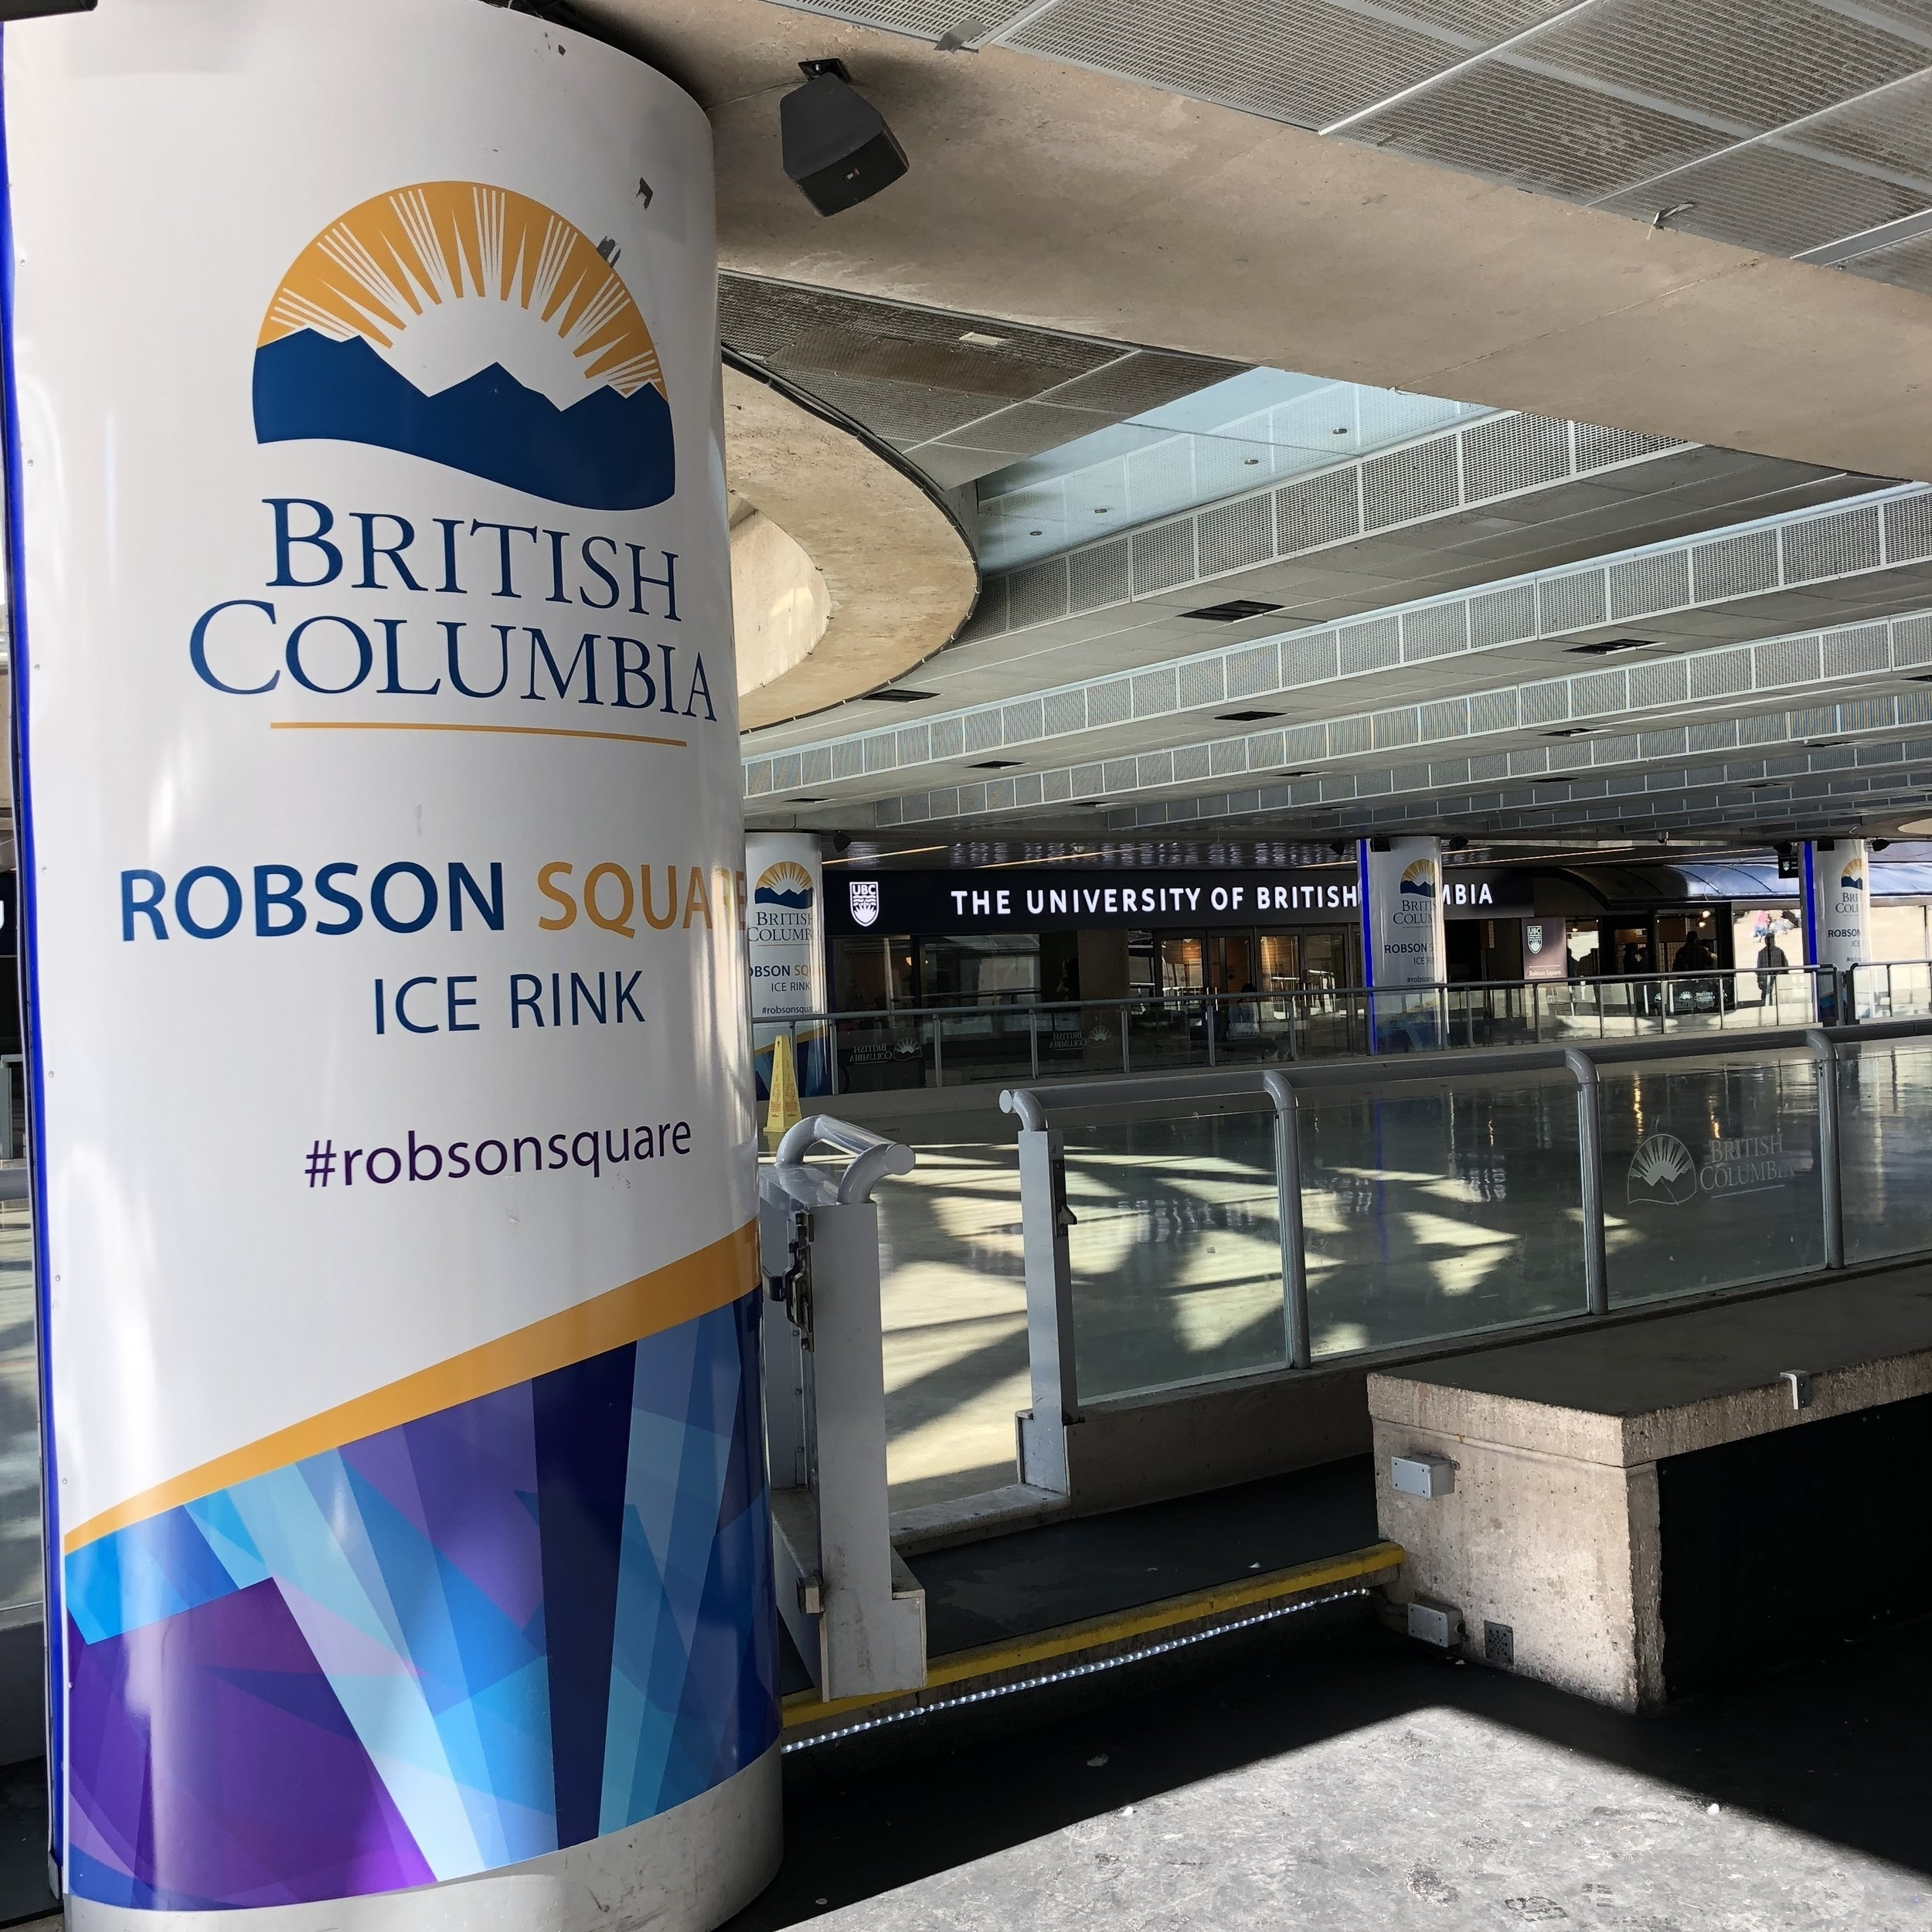 Listening Location:  Robson Square Ice Rink  800 Robson Street